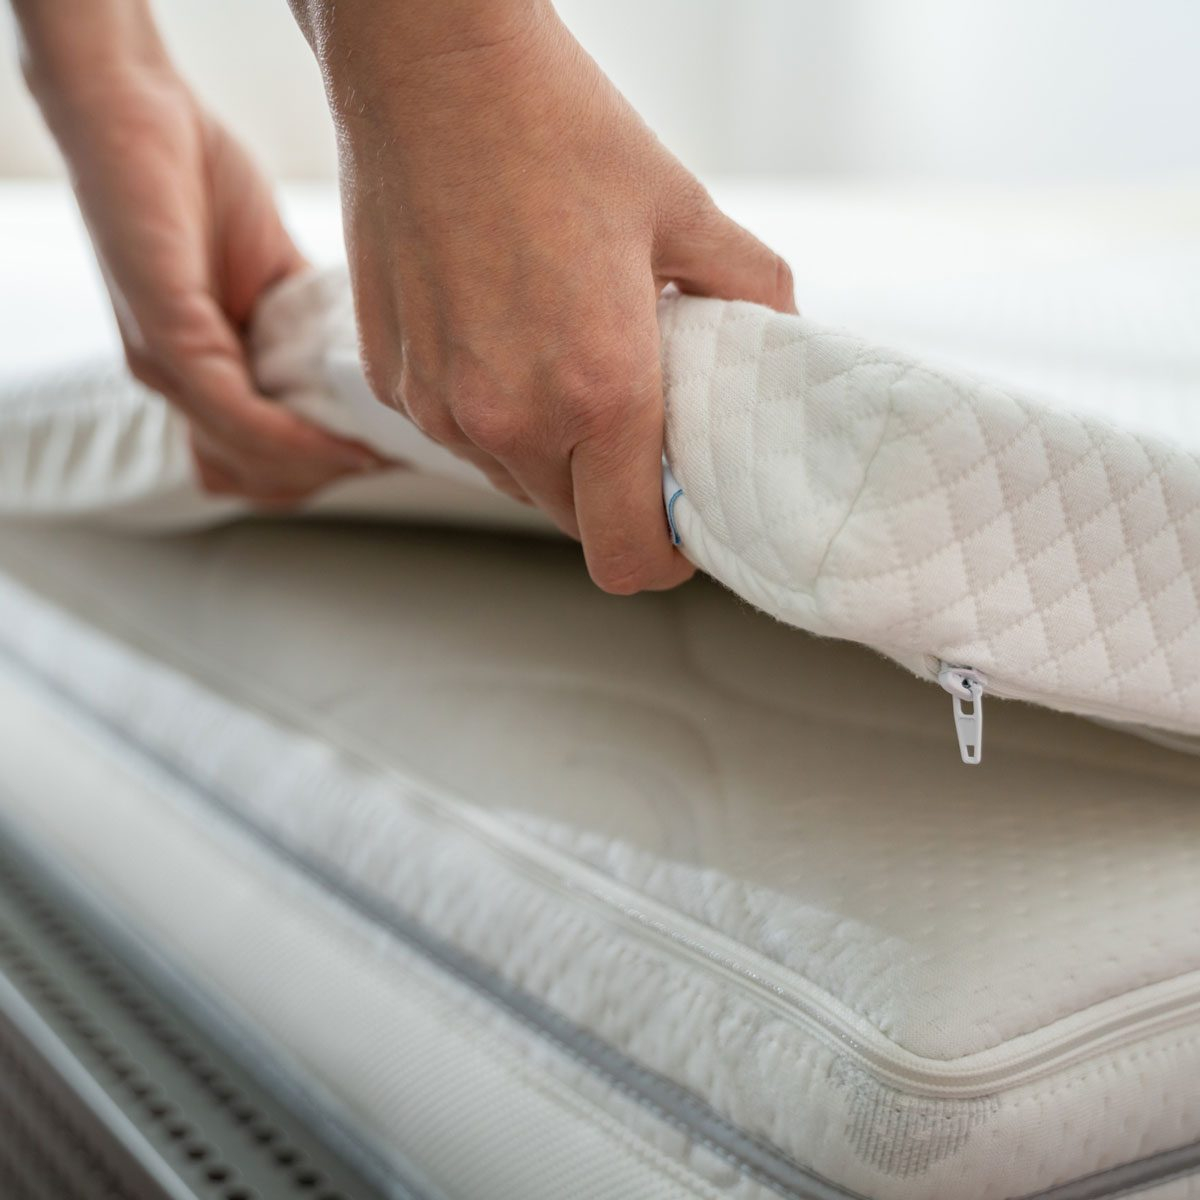 Adjusting a mattress topper